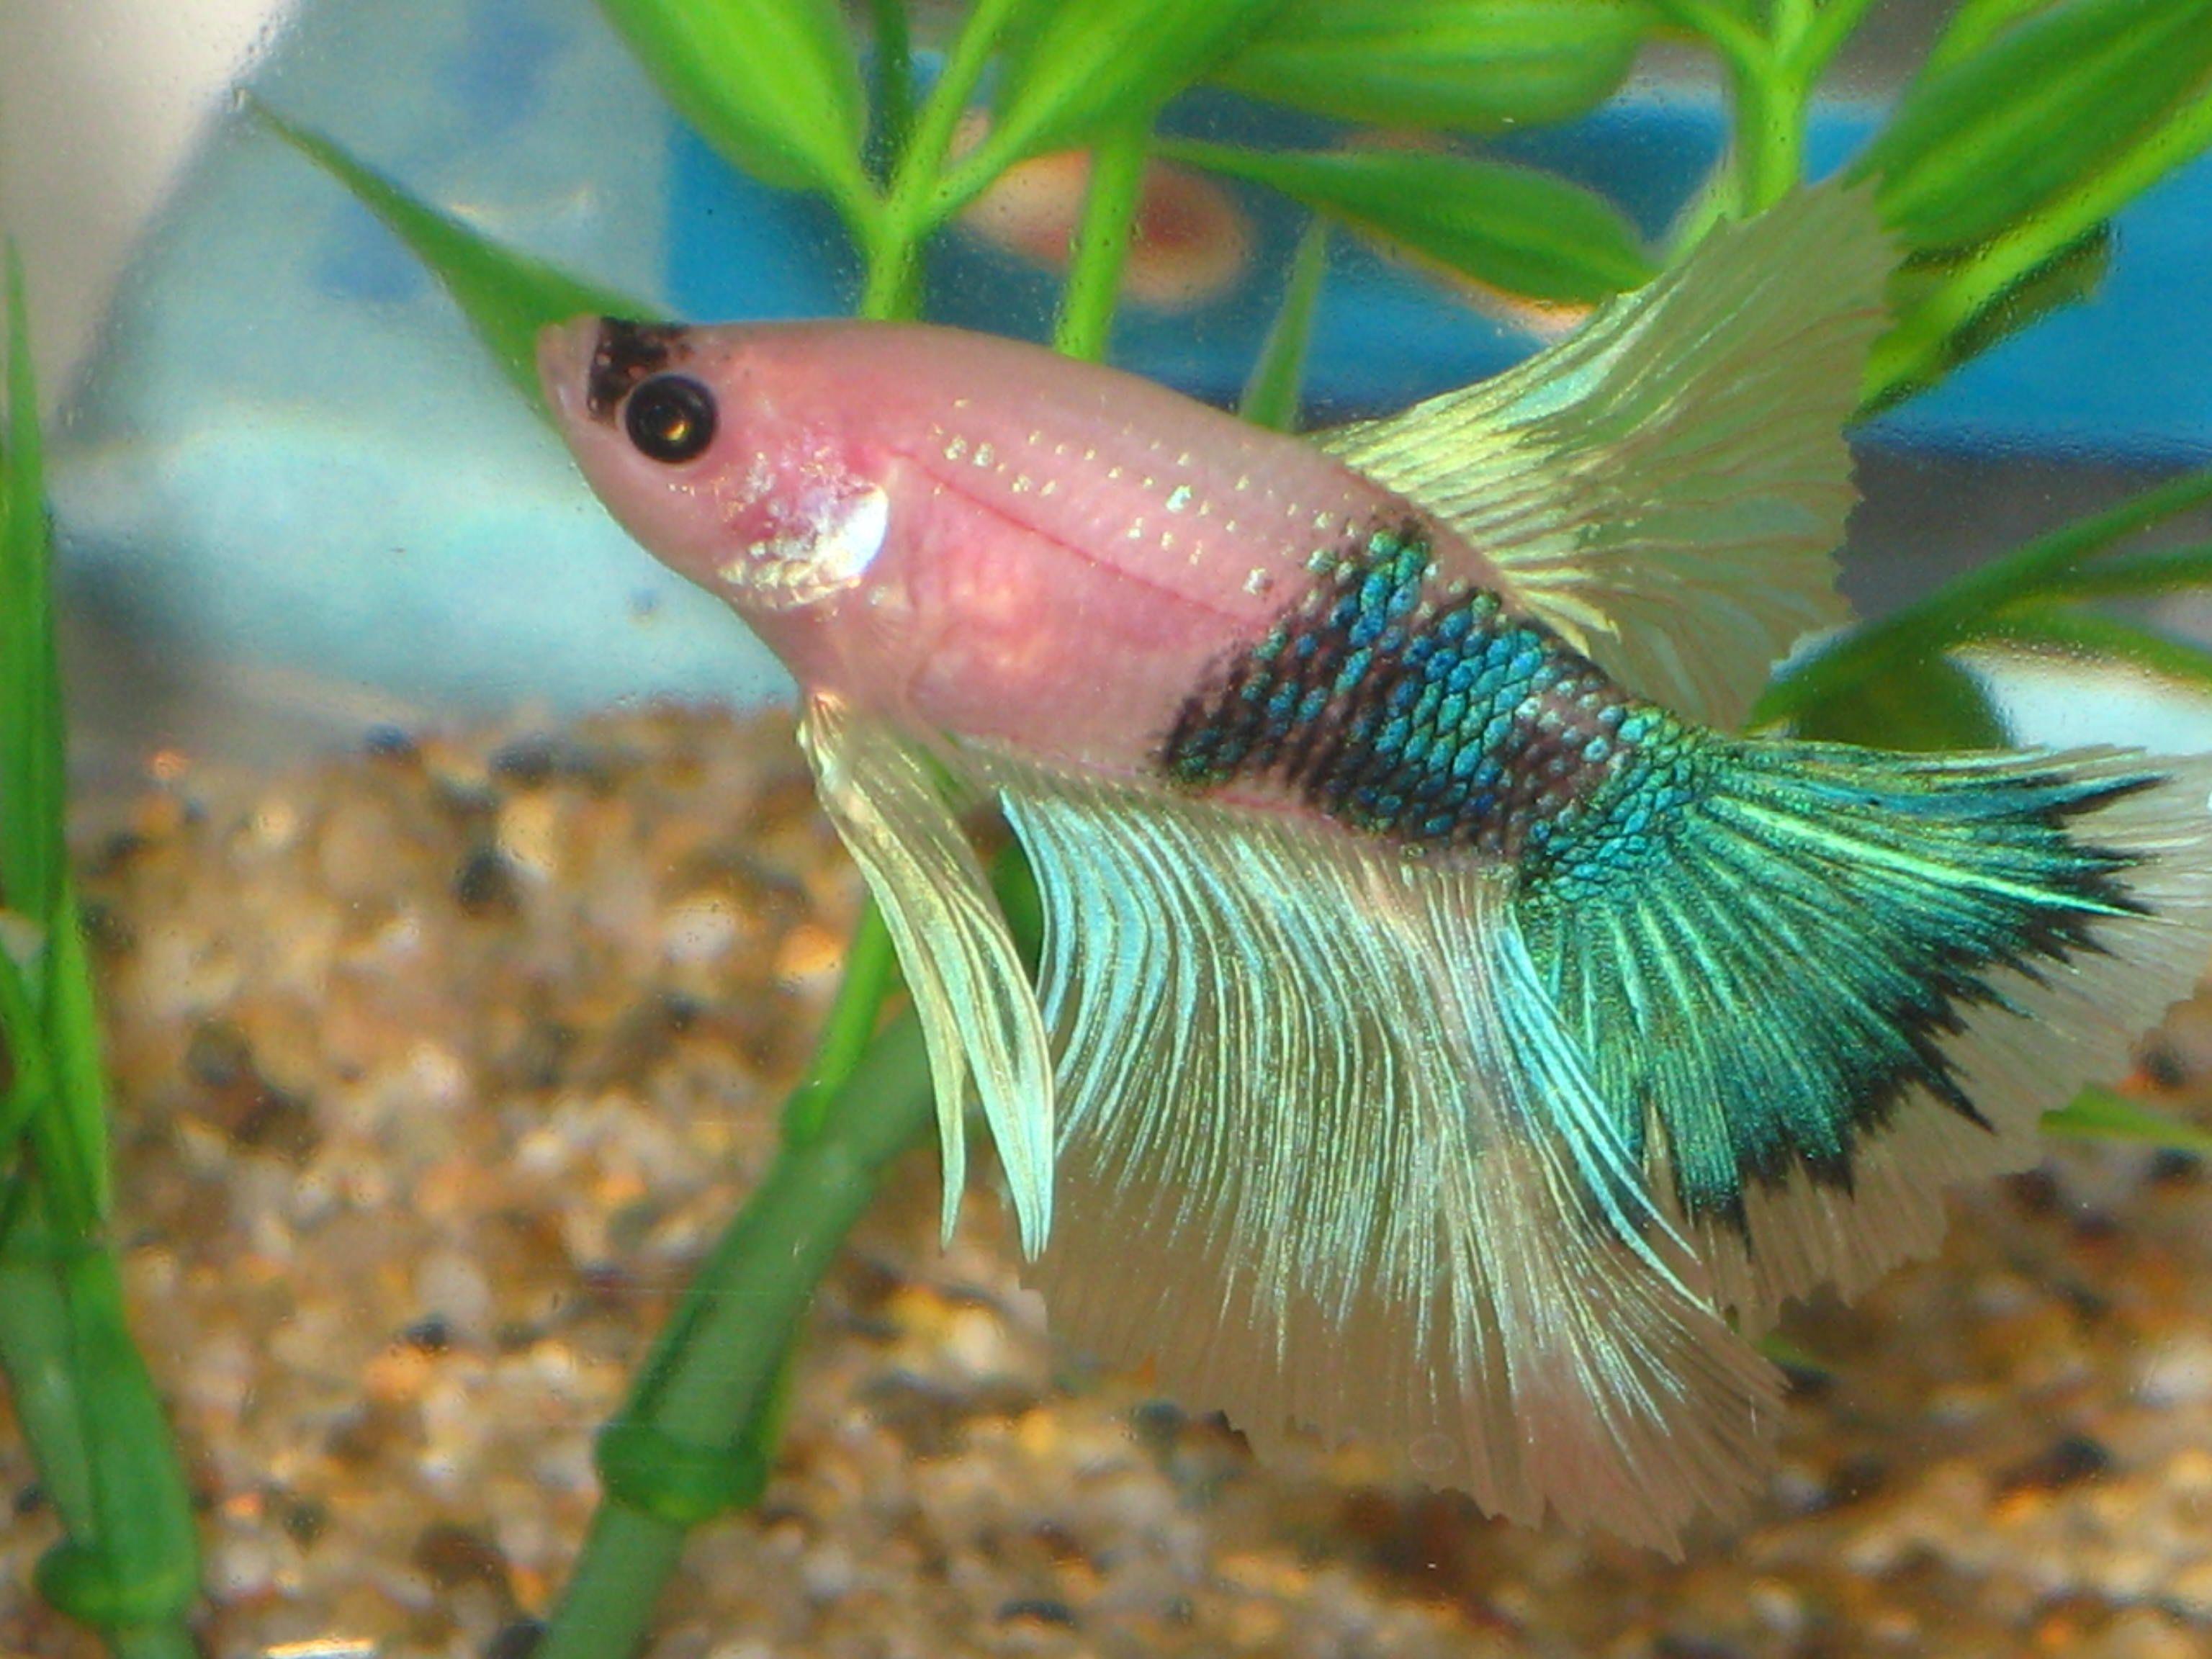 betta fish beauty queen | VIDA AQUATICA (Mares,Rios, Lagos, Lagoas ...